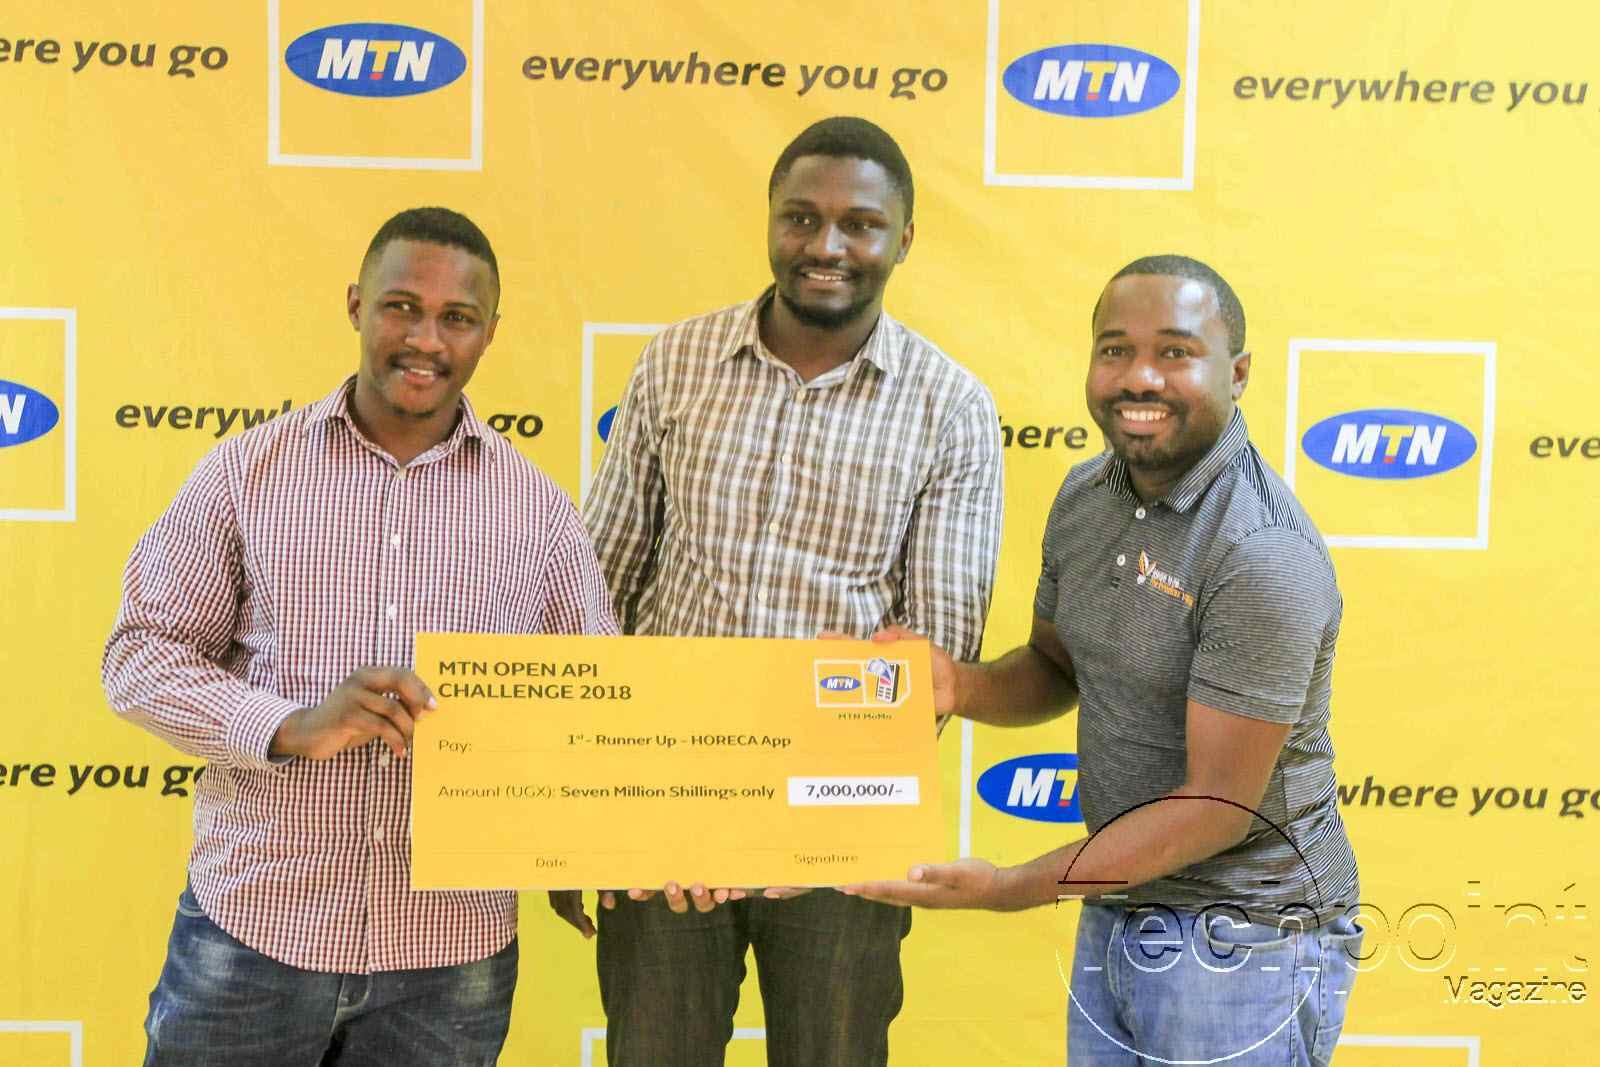 MTN OPEN API Challenge Winners via Innovation Challenge